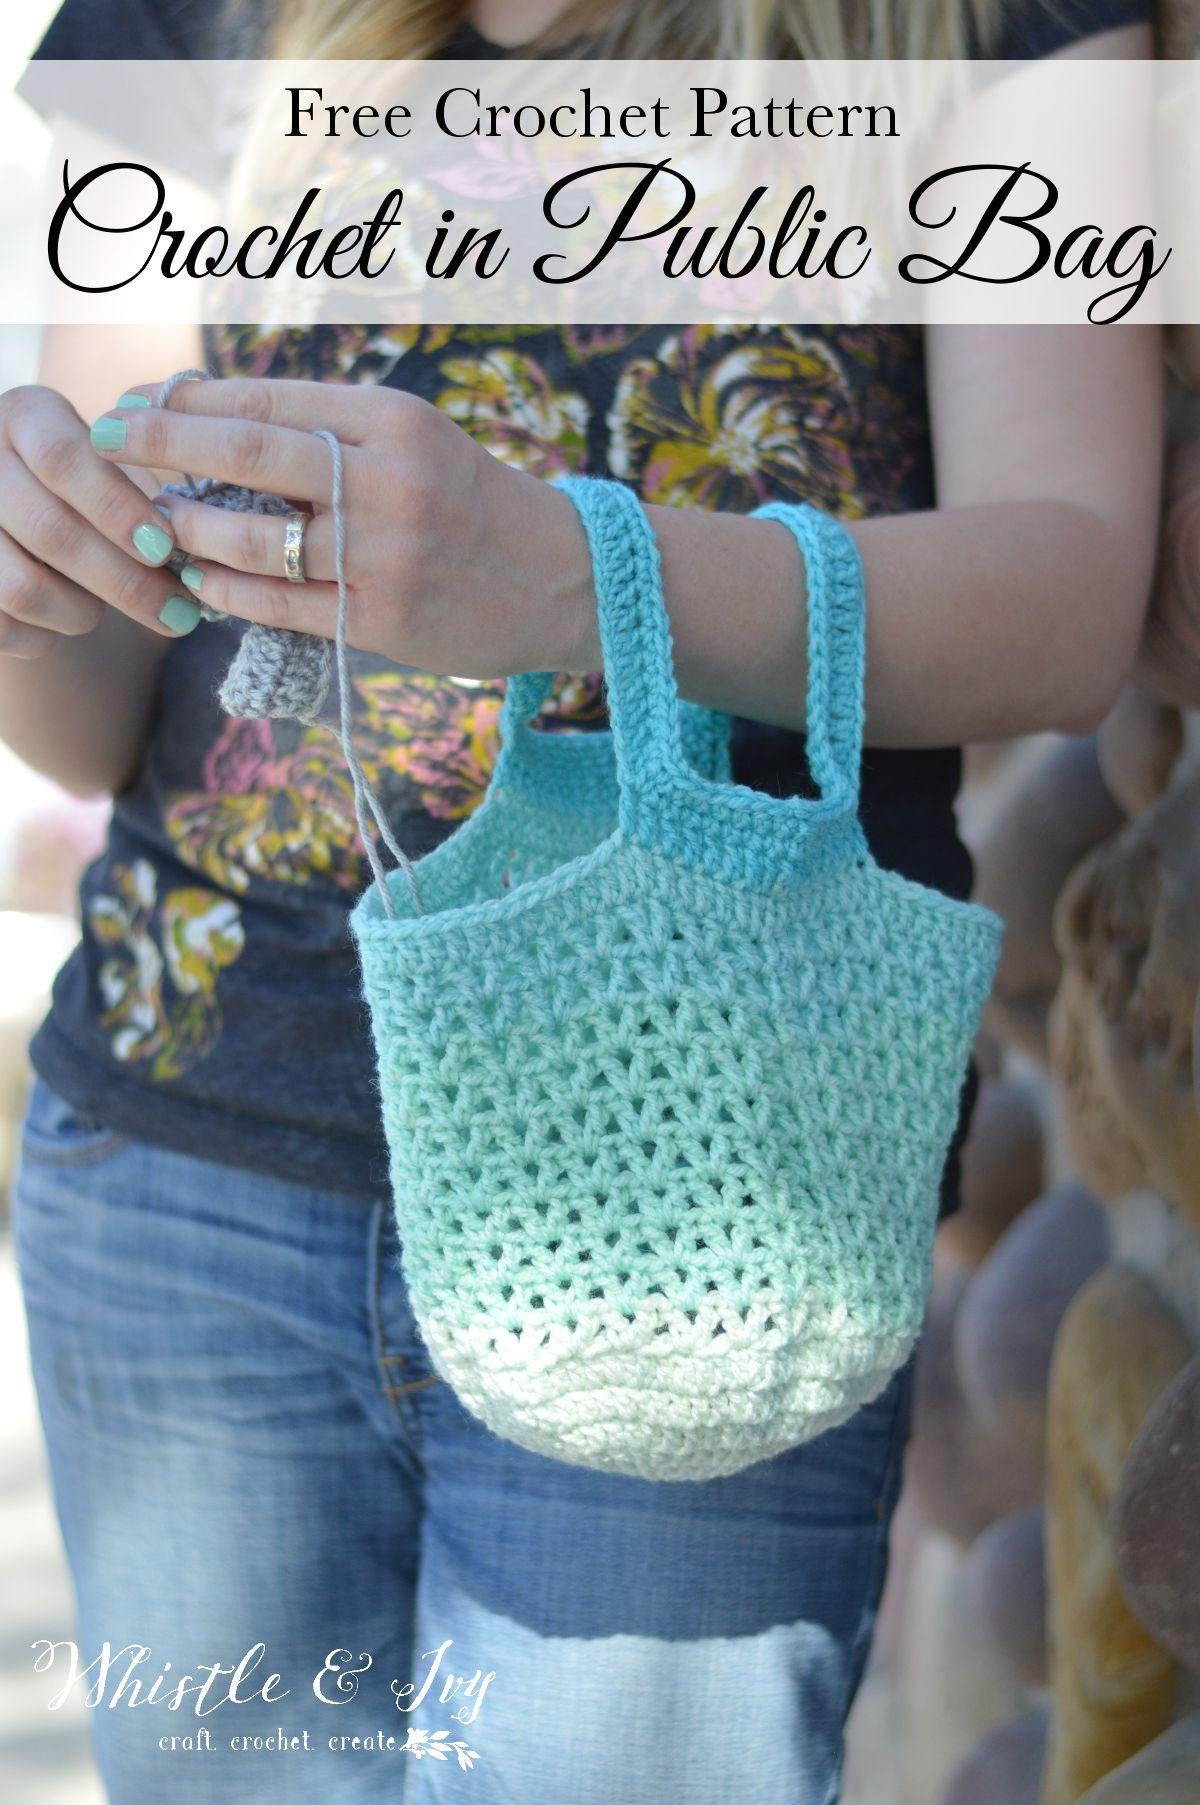 Crochet in Public Bag Pattern | Pinterest | Free crochet, Yarns and Arms